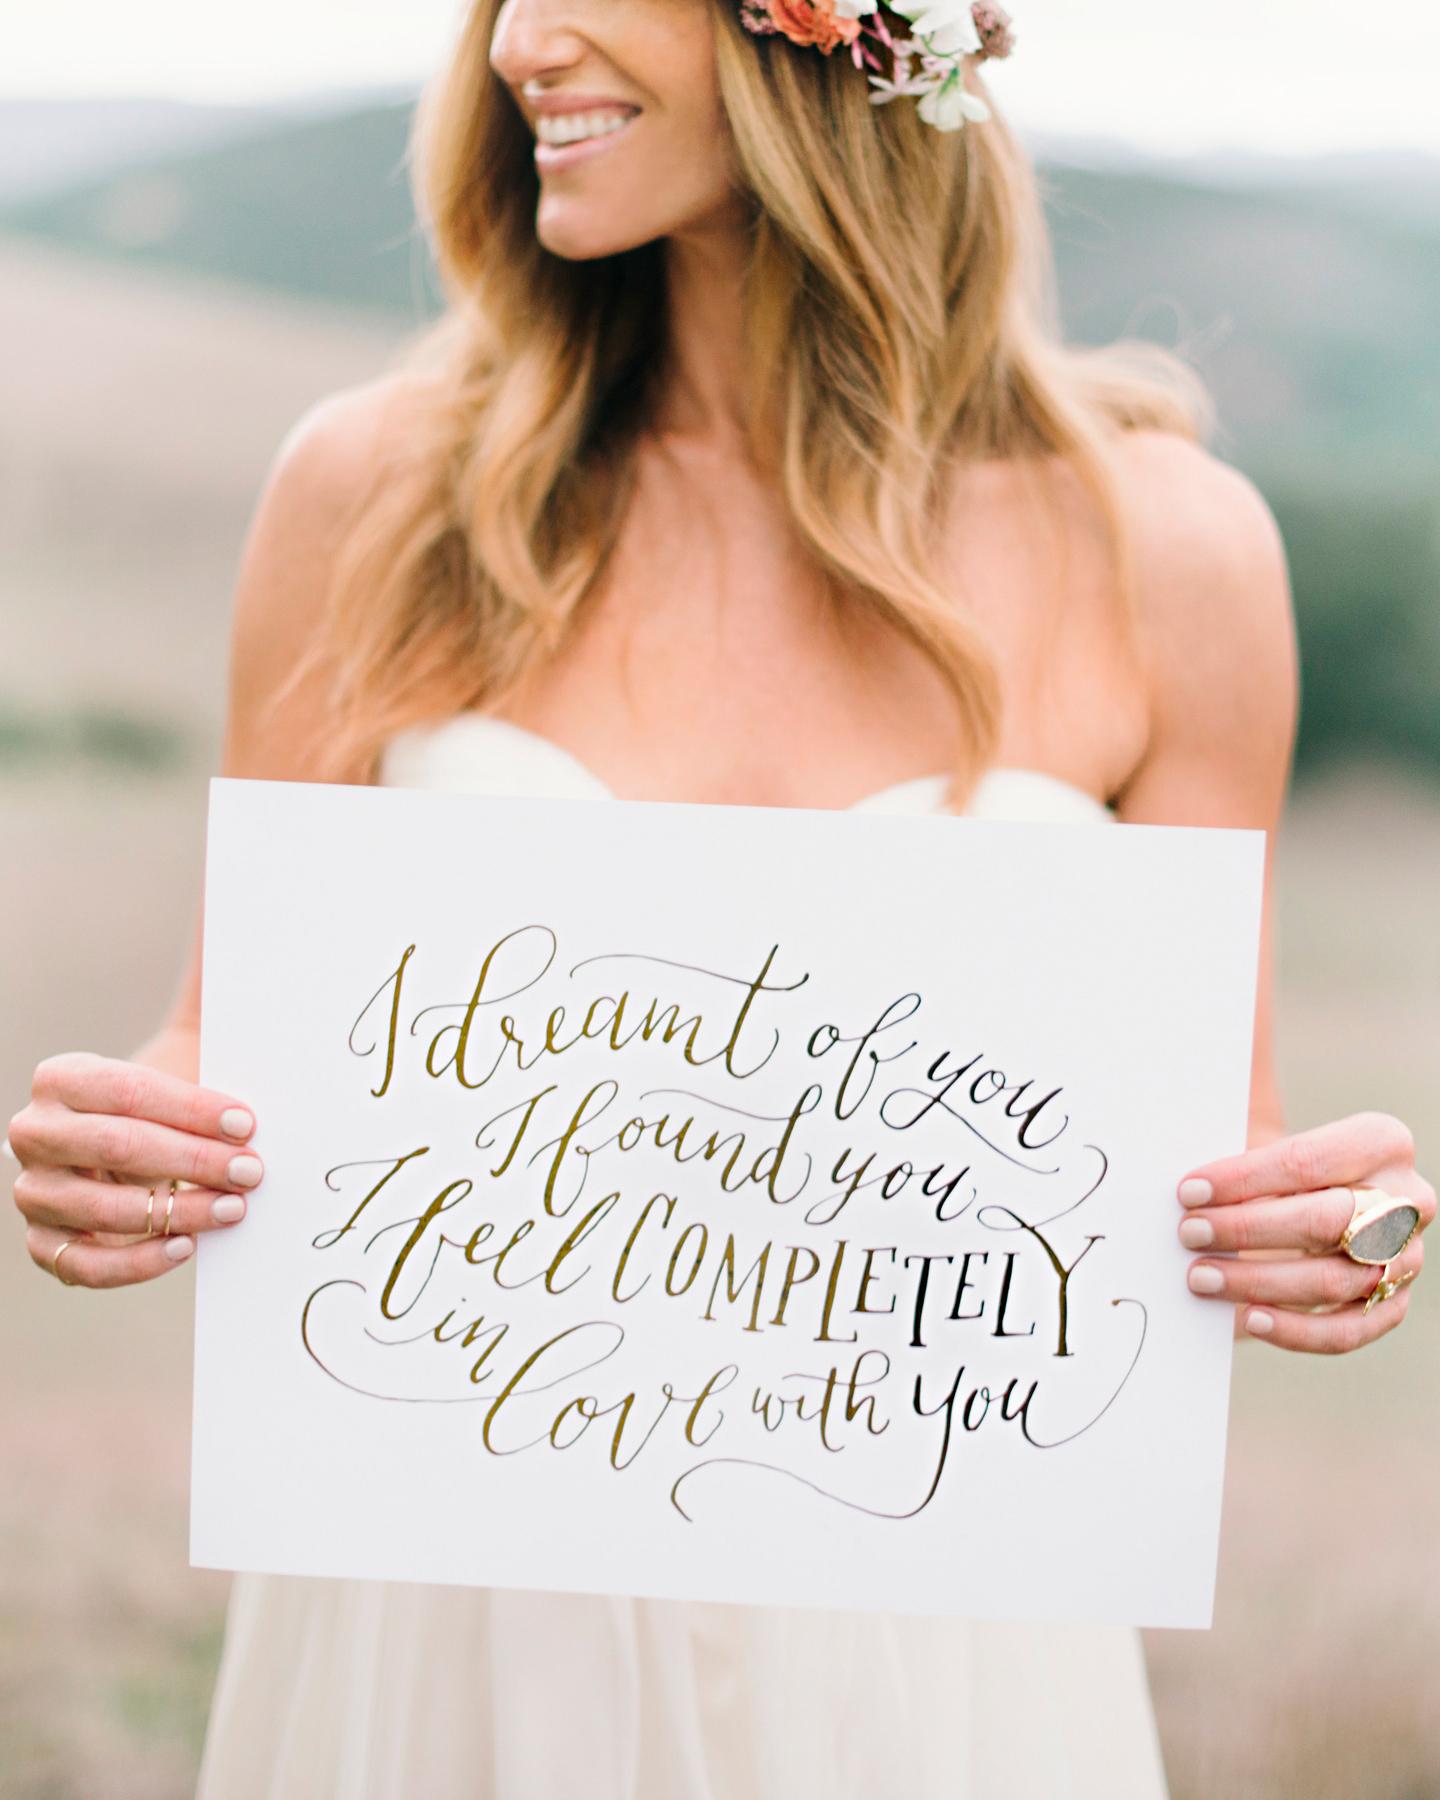 carlie-gabe-wedding-vow-renewal-323dm1-5544-s111570.jpg